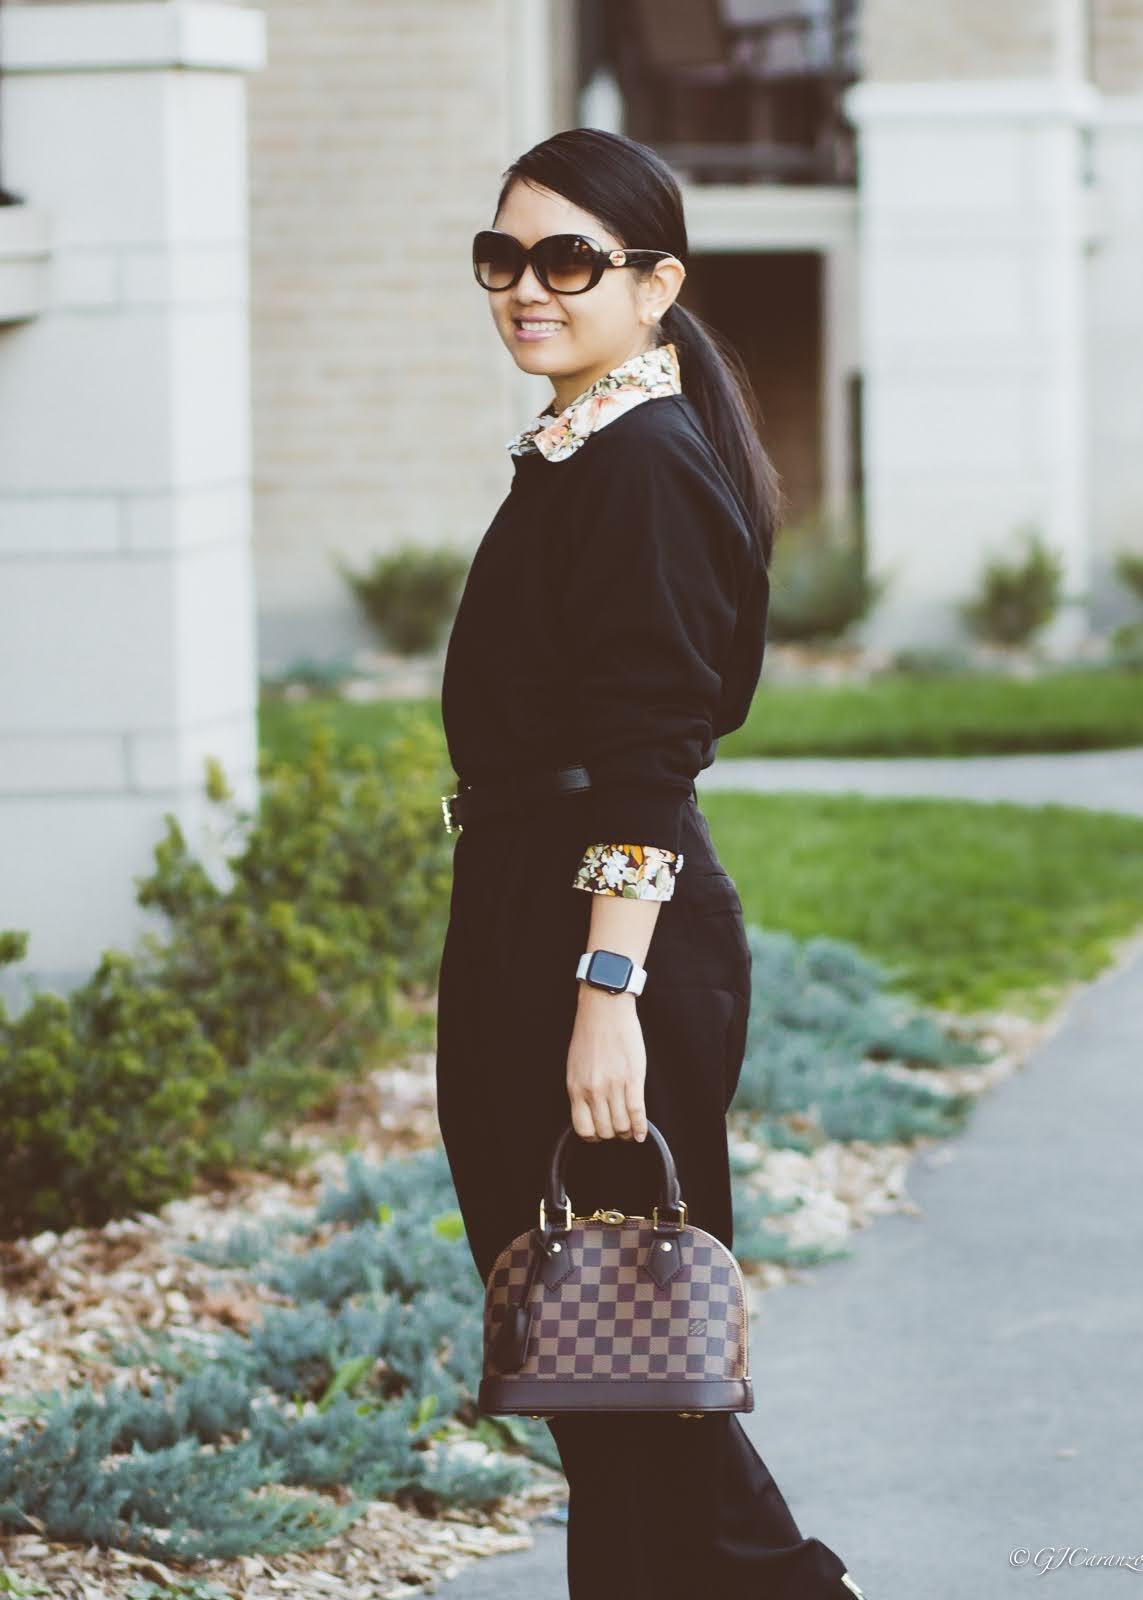 H&M Sweatshirt | Zara Floral Print Blouse | H&M Dress Pants | Louis Vuitton Alma BB in Damier Ebene | Tory Burch Reversible Belt | Steve Madden Ankle Boots | Petite Outfit